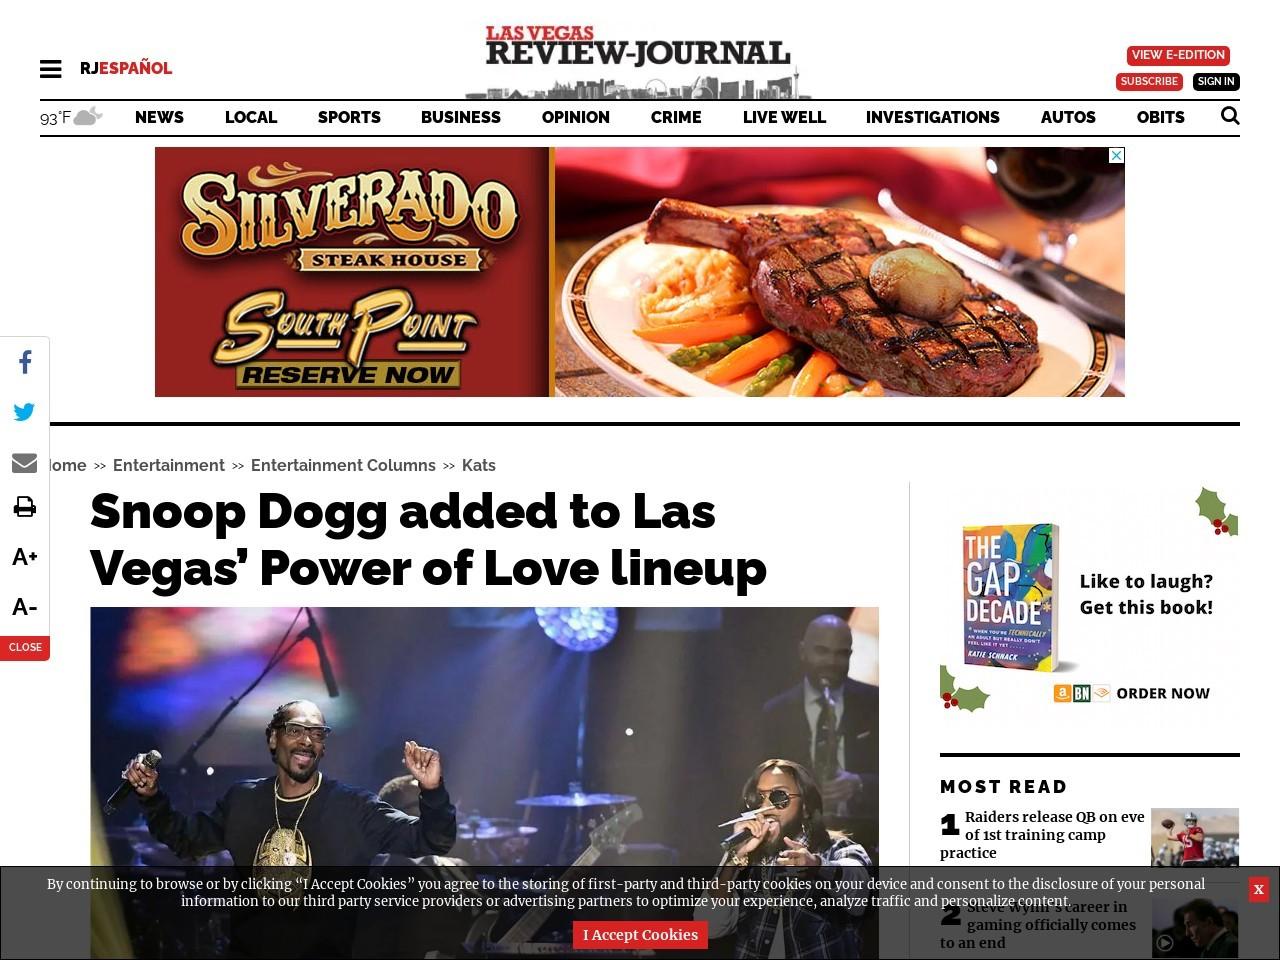 Snoop Dogg added to Las Vegas' Power of Love lineup